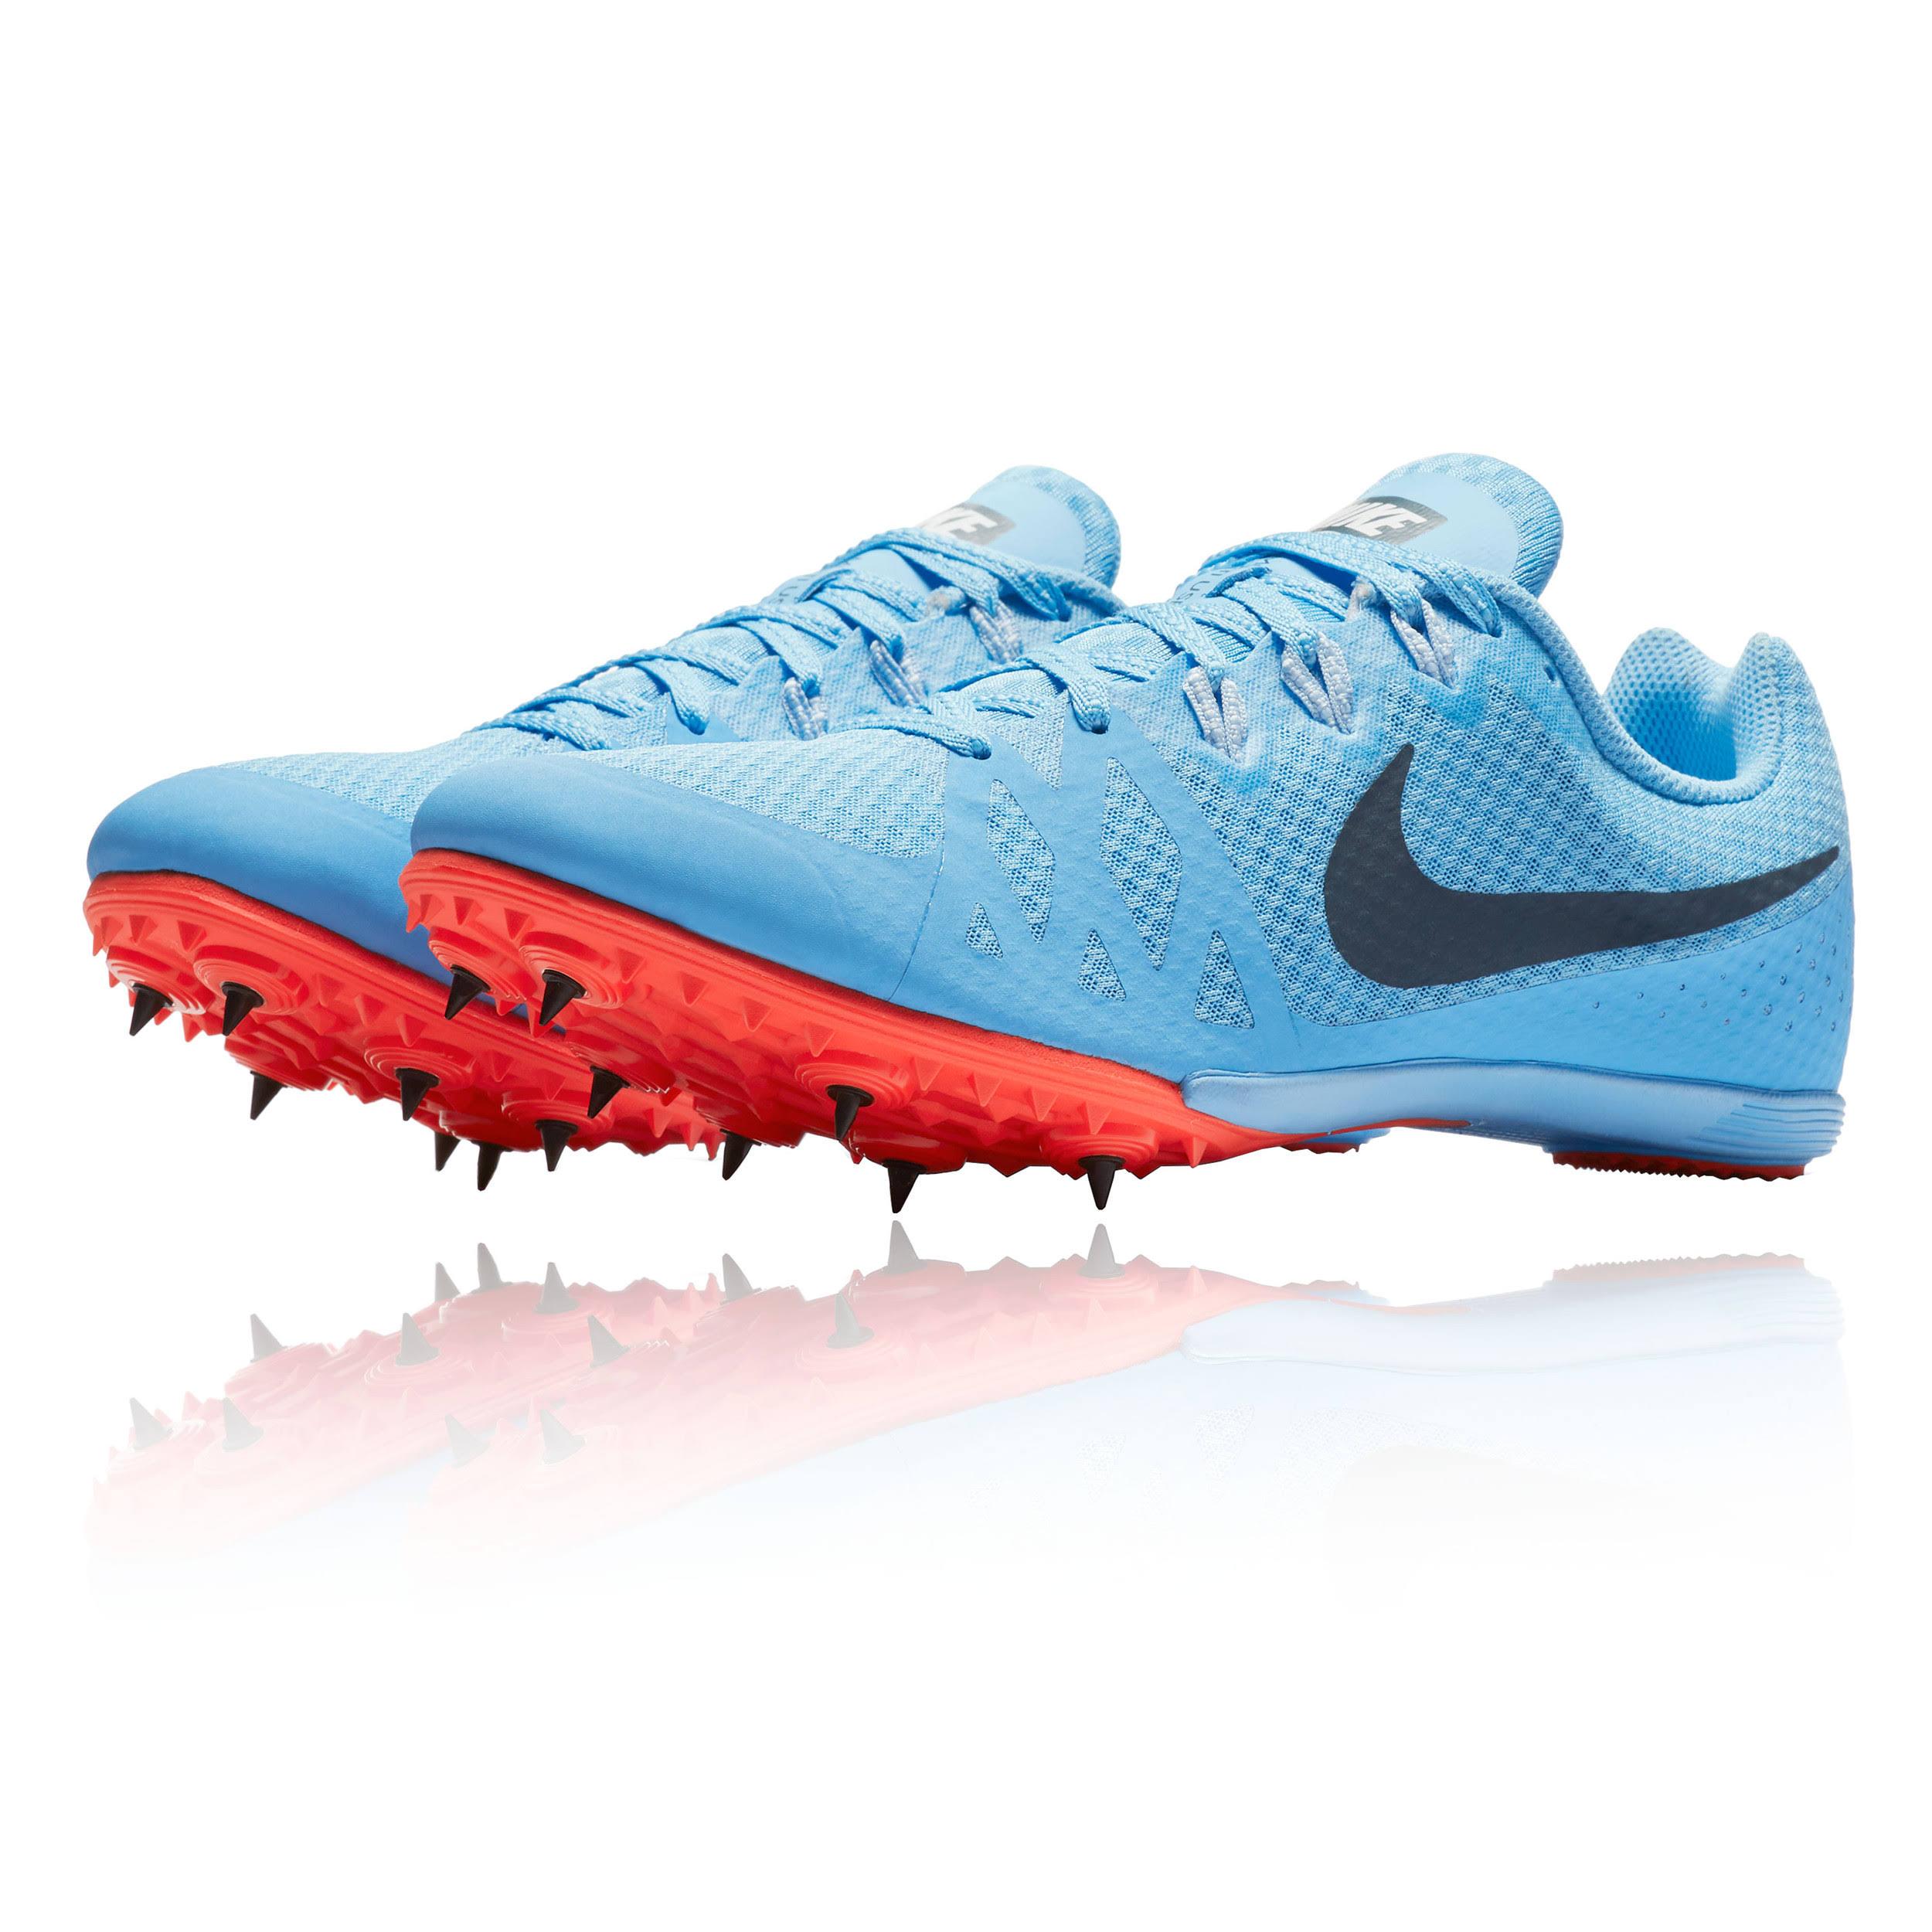 8 45 Zoom M Blue Nike 5 806555446 Rival Schuhe Größe 0OwOqPI